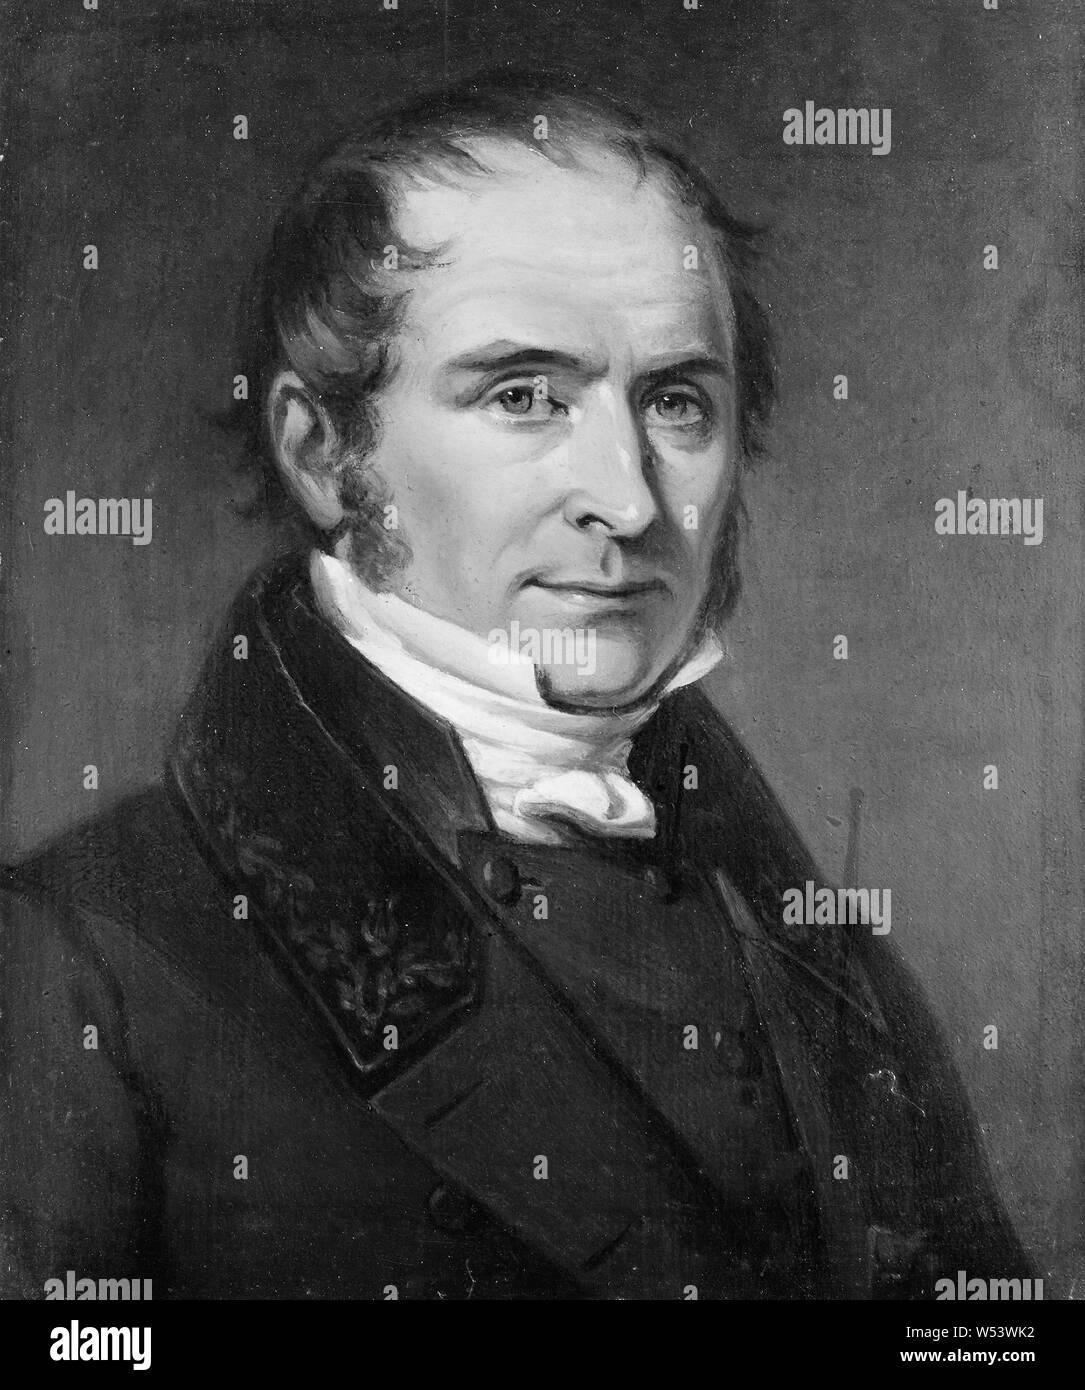 Johan Gustaf Sandberg, Elias Magnus Fries, 1794-1878, Malerei, 1838, Öl, Höhe, 23 cm (9 Zoll), Breite 19 cm (7,4 Zoll) Stockfoto